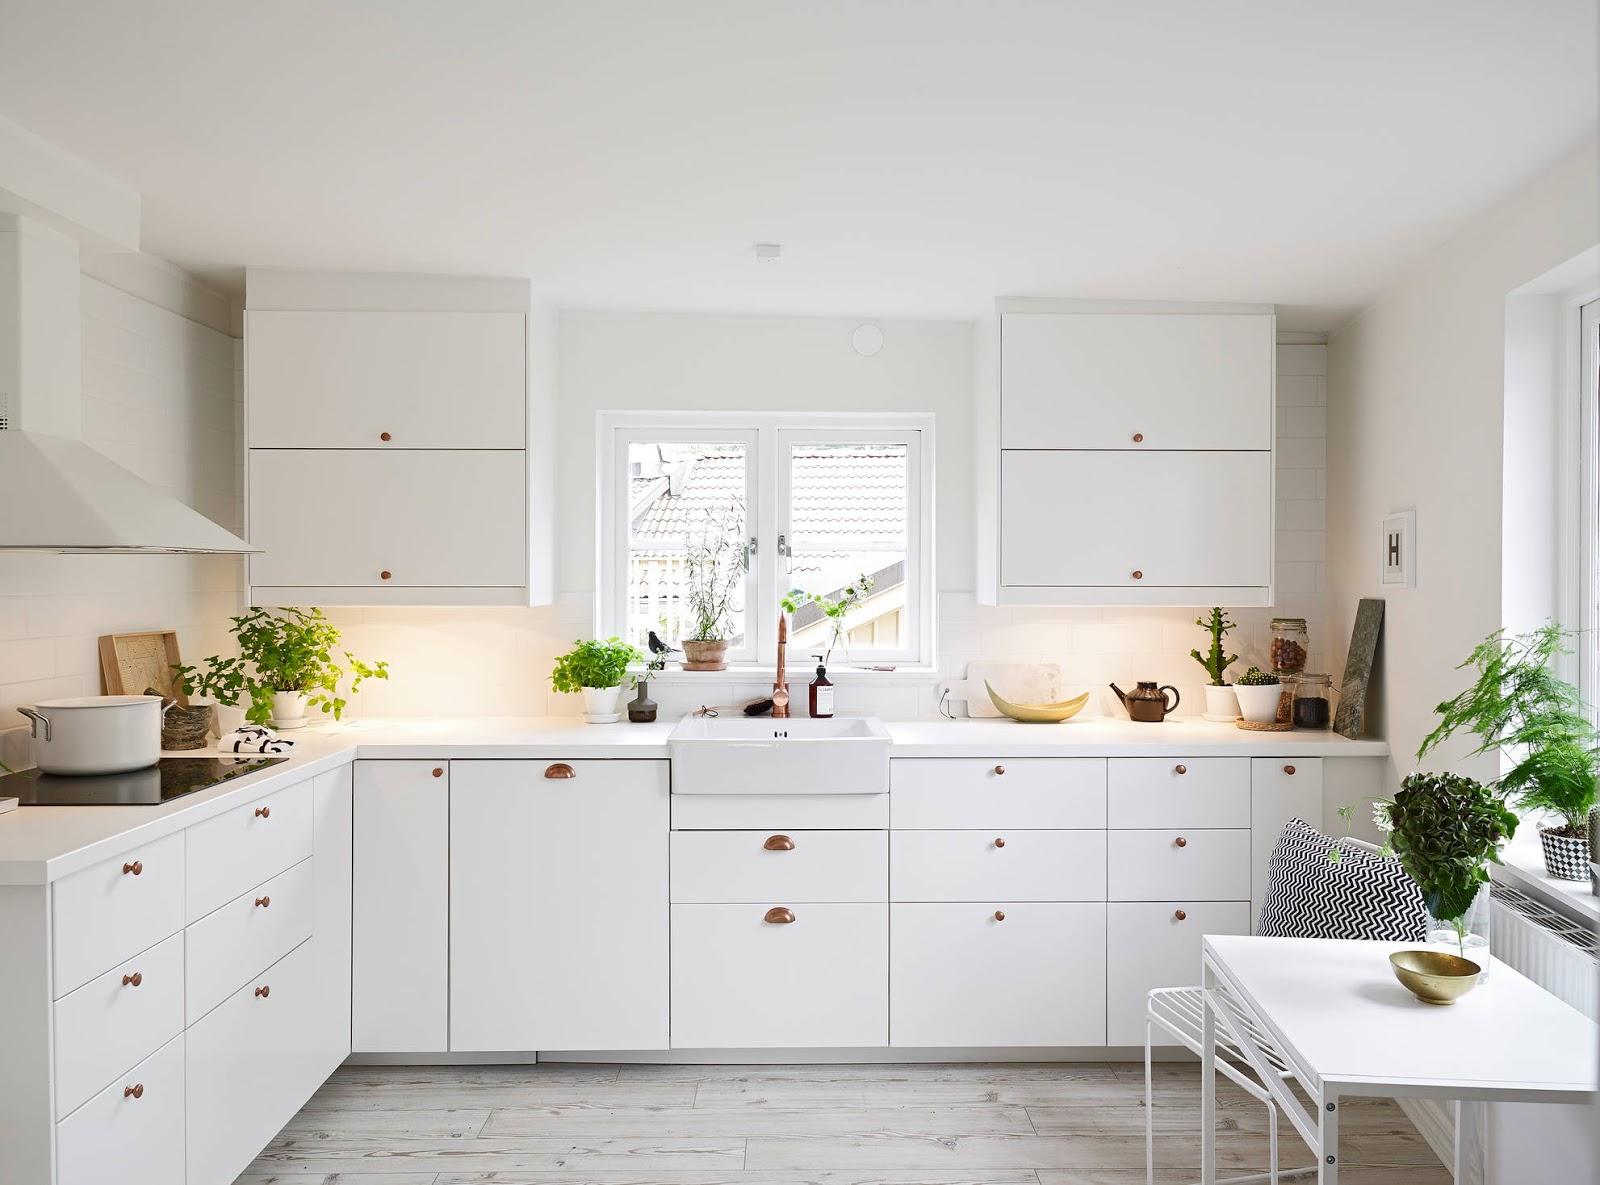 Arredamento Casa Stile Scandinavo : Arredare casa stile nordico ...